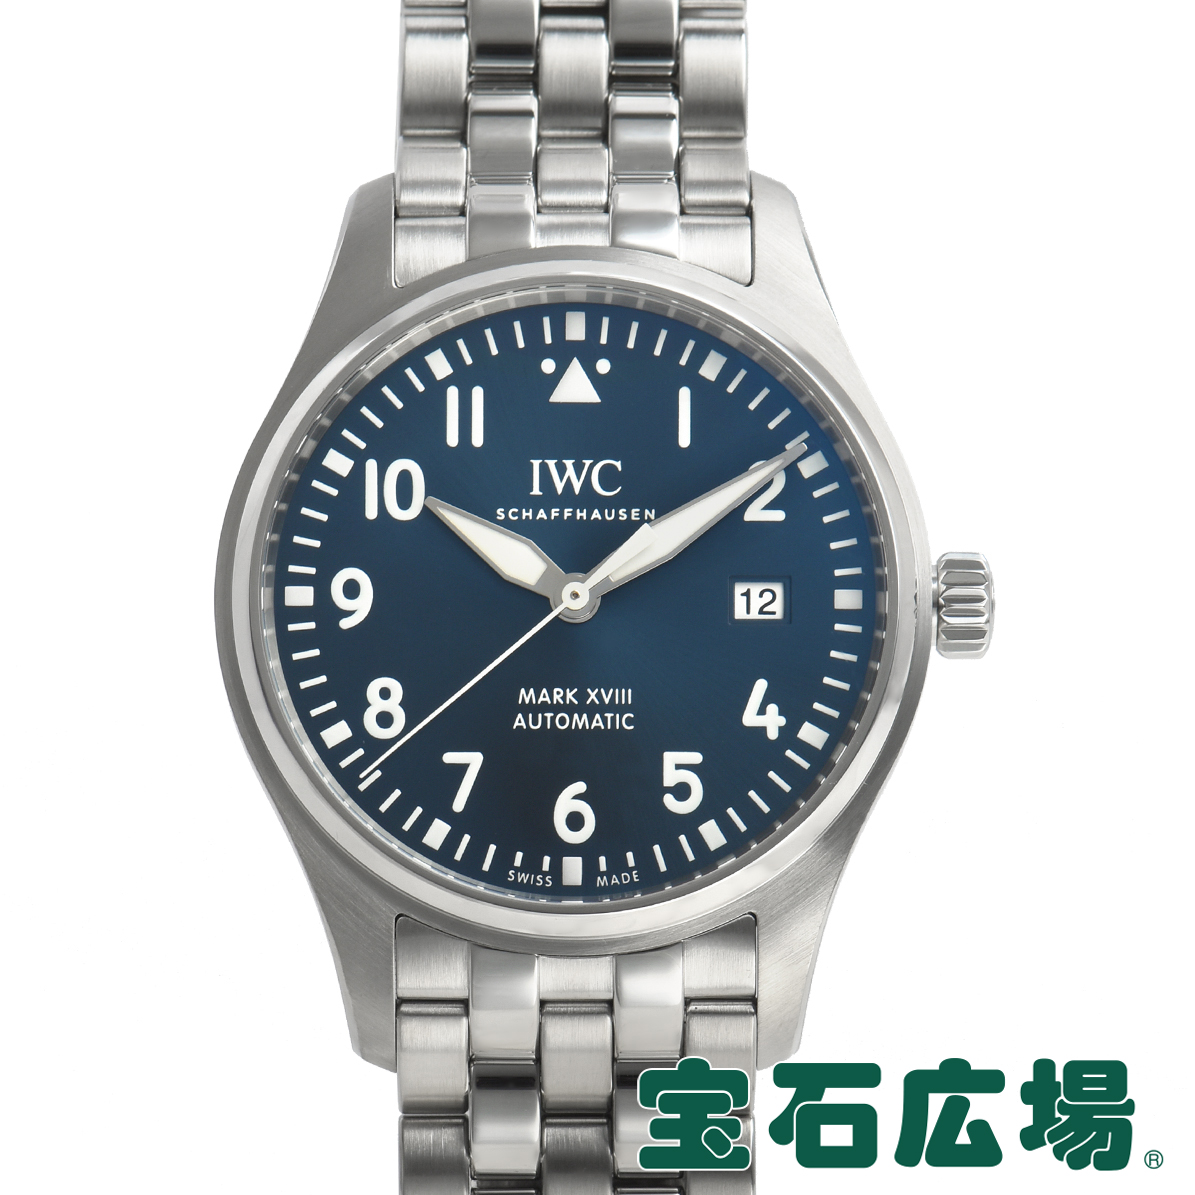 IWC (アイ・ダブリュー・シー) パイロットウォッチ マーク18 プティプランス IW327004【中古】メンズ 腕時計 送料・代引手数料無料